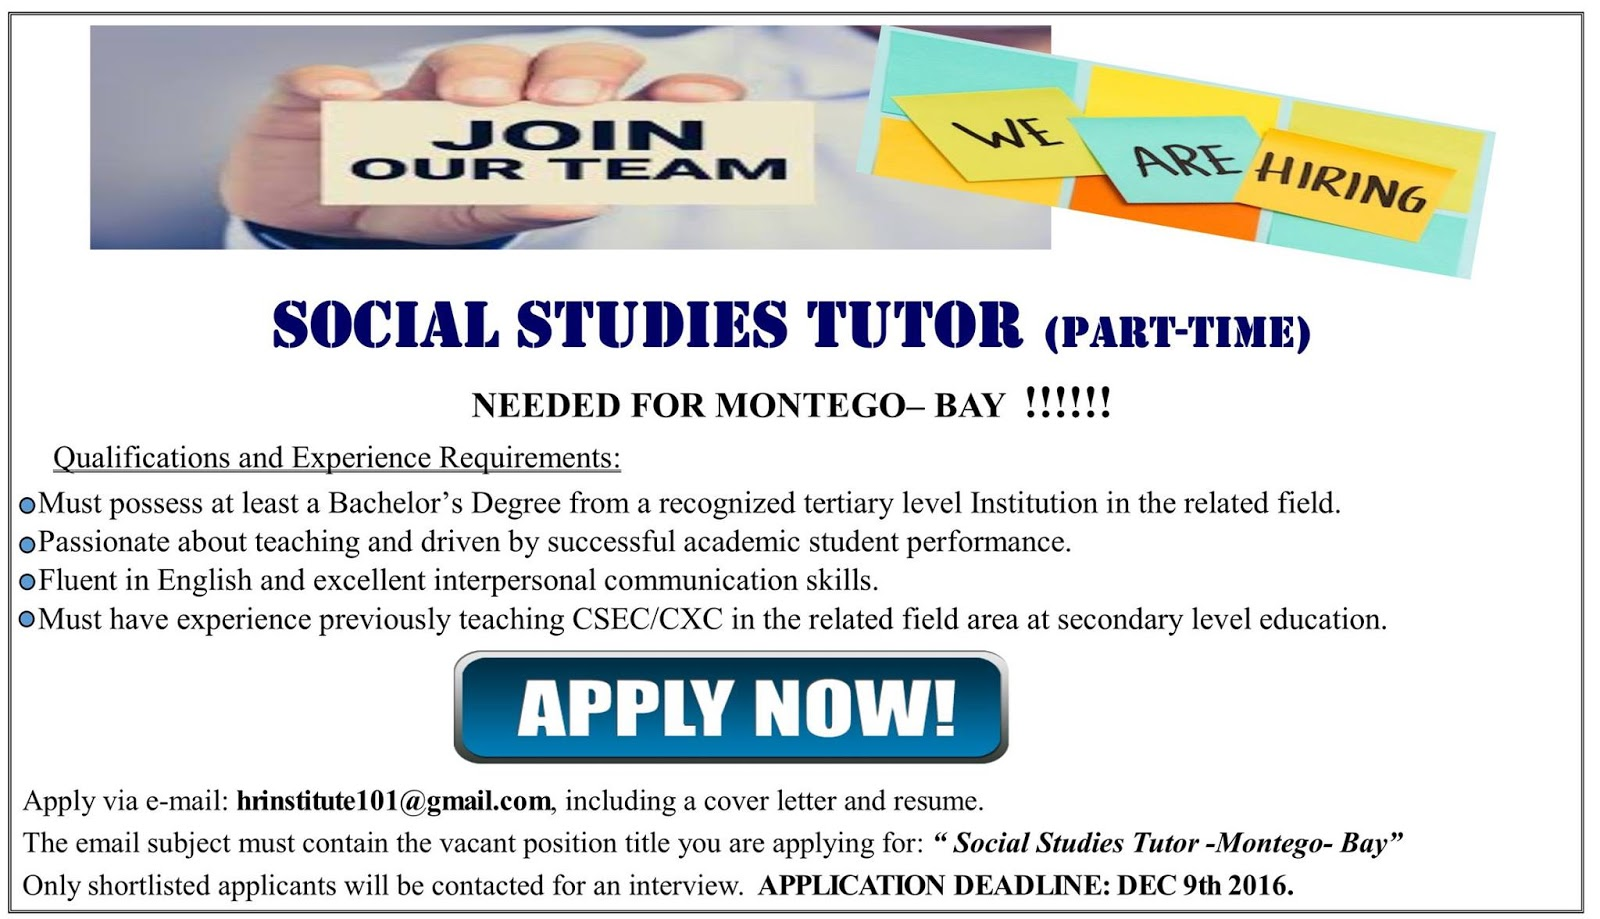 Jobs Postings Caribbean Social Stu s Tutor Part Time